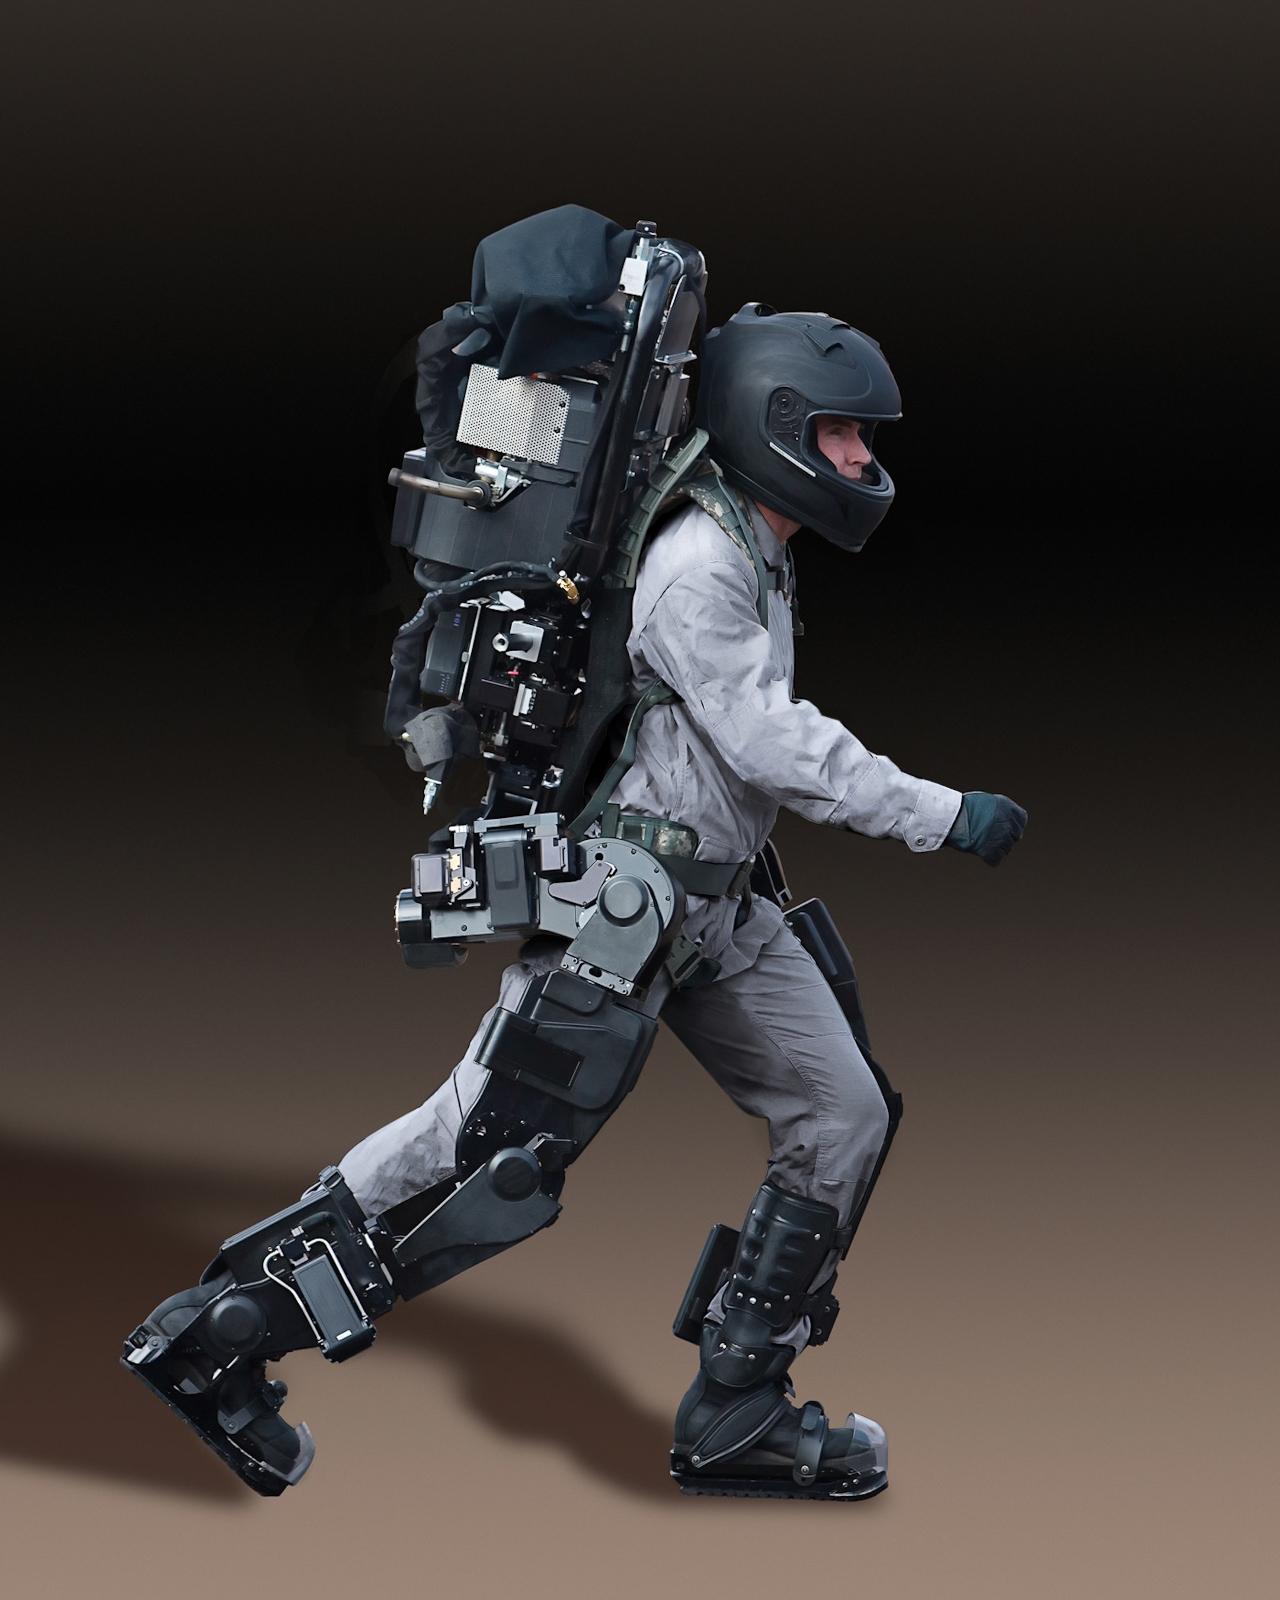 sarcos guardian exoskeleton